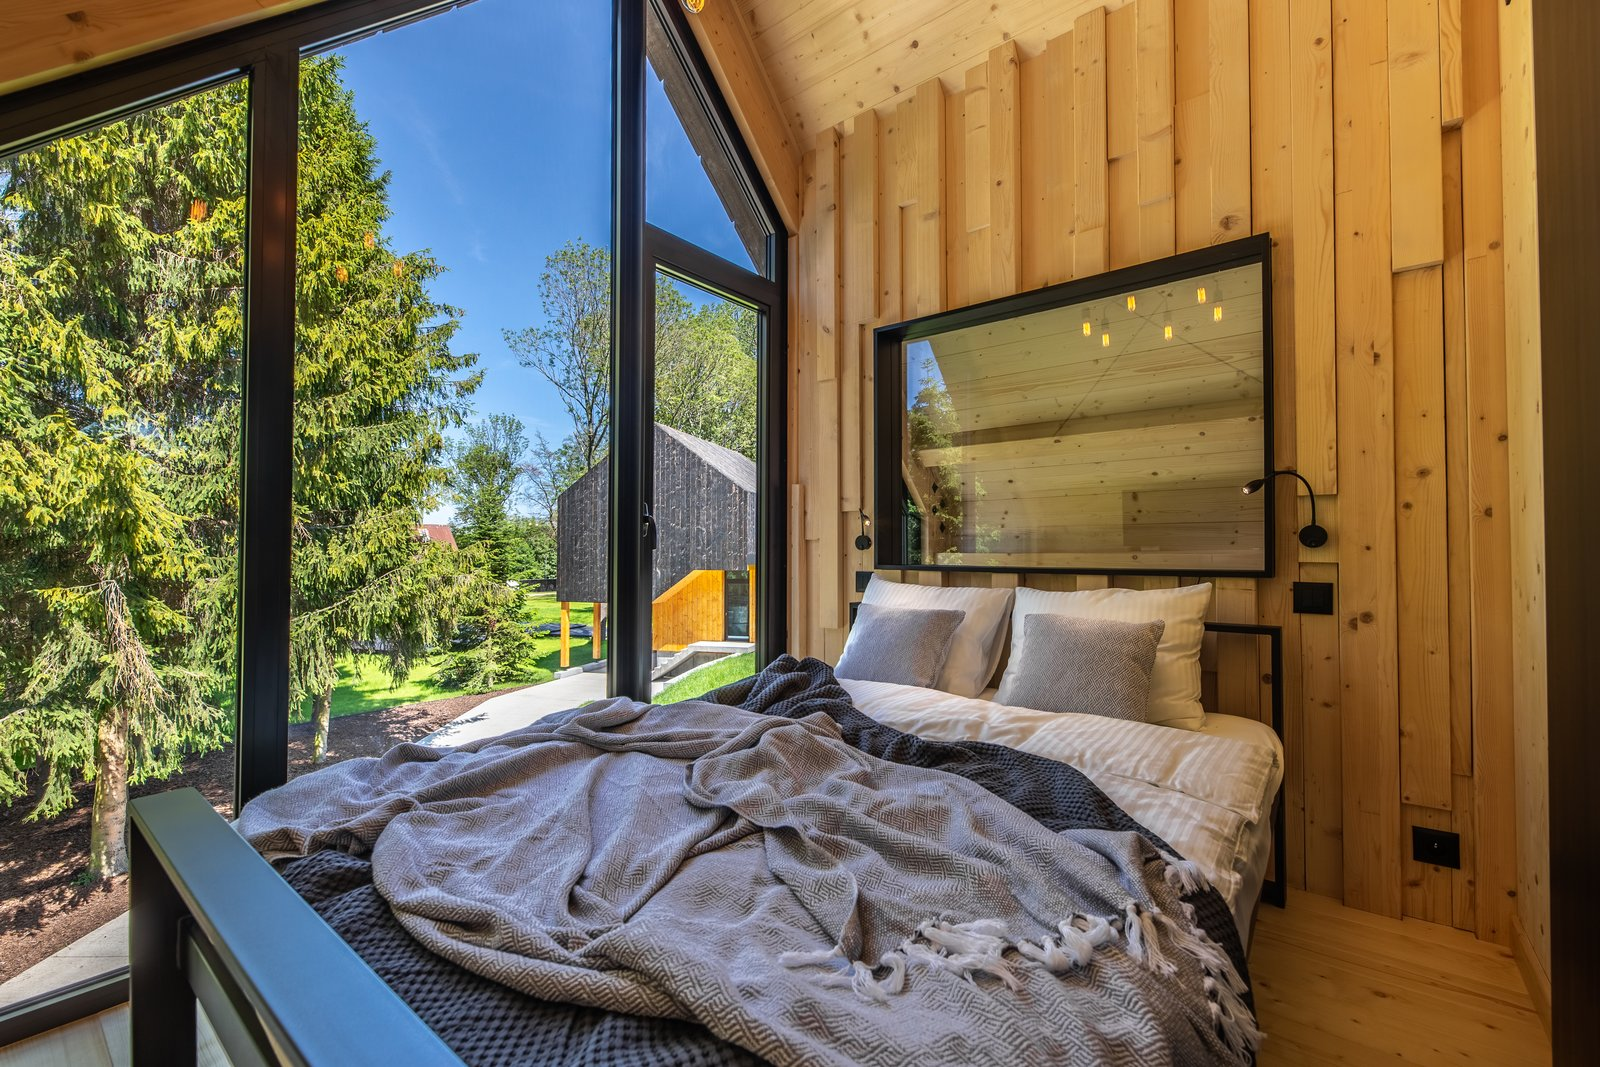 Cammpinus Park mode:lina bedroom